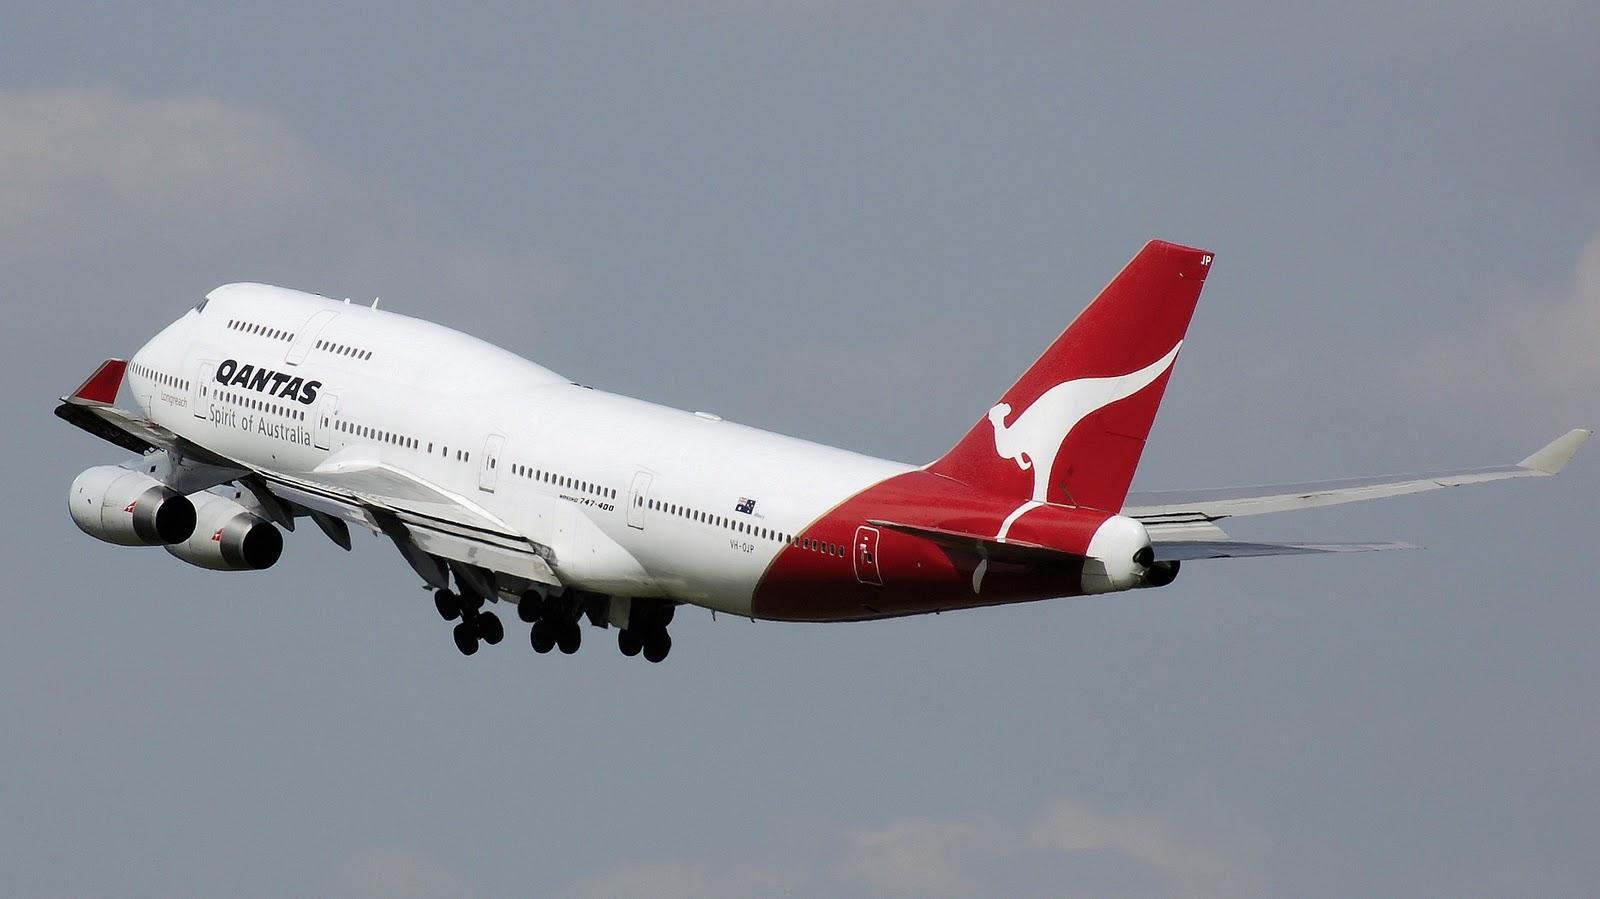 http://1.bp.blogspot.com/_ja676MG45Zg/TQcSUuG_G_I/AAAAAAAAEwQ/sQ9dp551edA/s1600/qantas-spirit-of-australia-b747-400.jpg